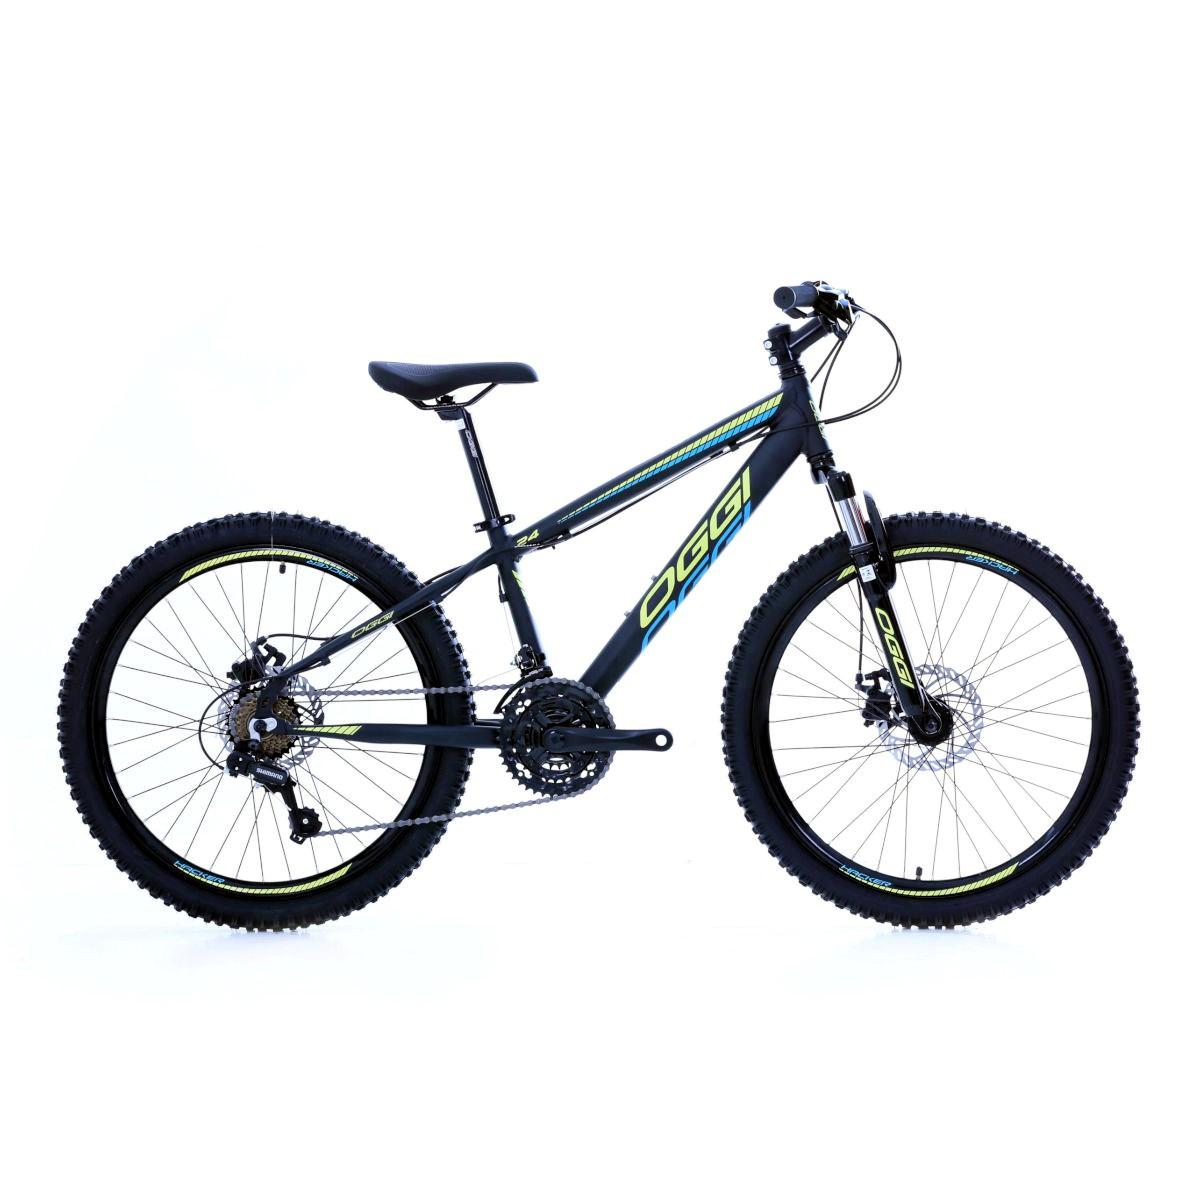 Bicicleta Oggi Hacker aro 24 21v  Pto/Amarelo/Azul